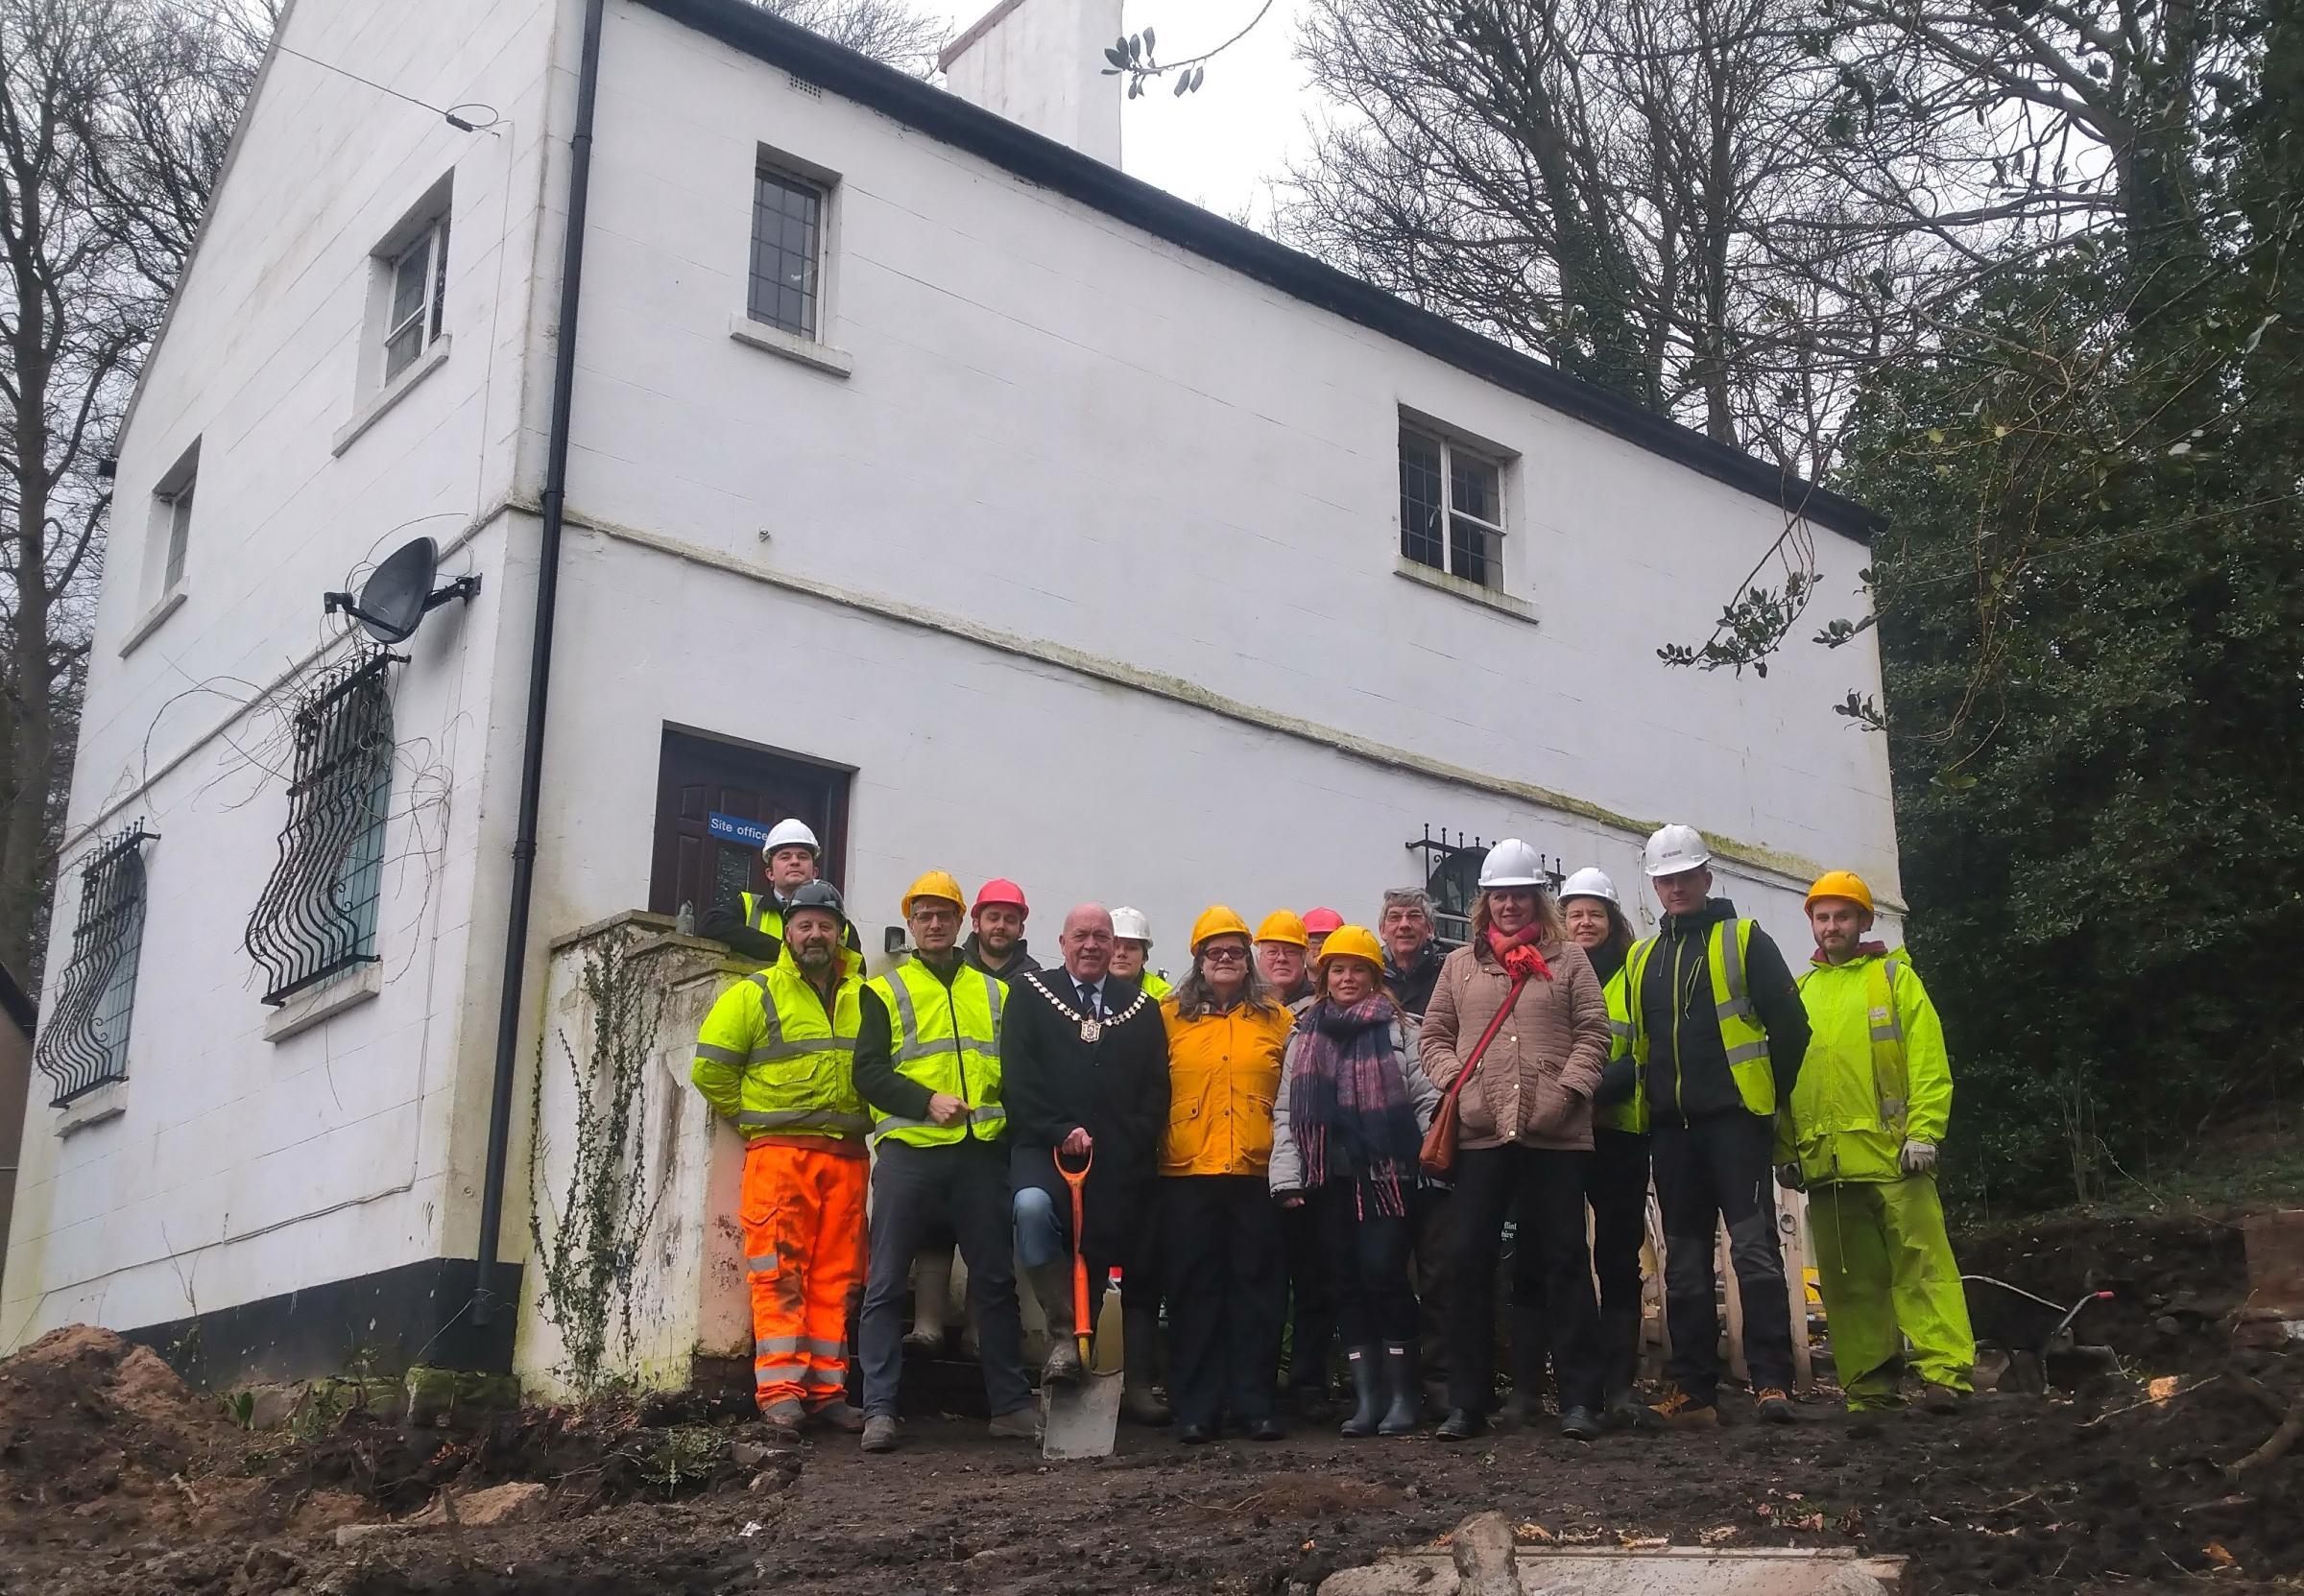 Mold mayor breaks ground at Bailey Hill as restoration scheme begins